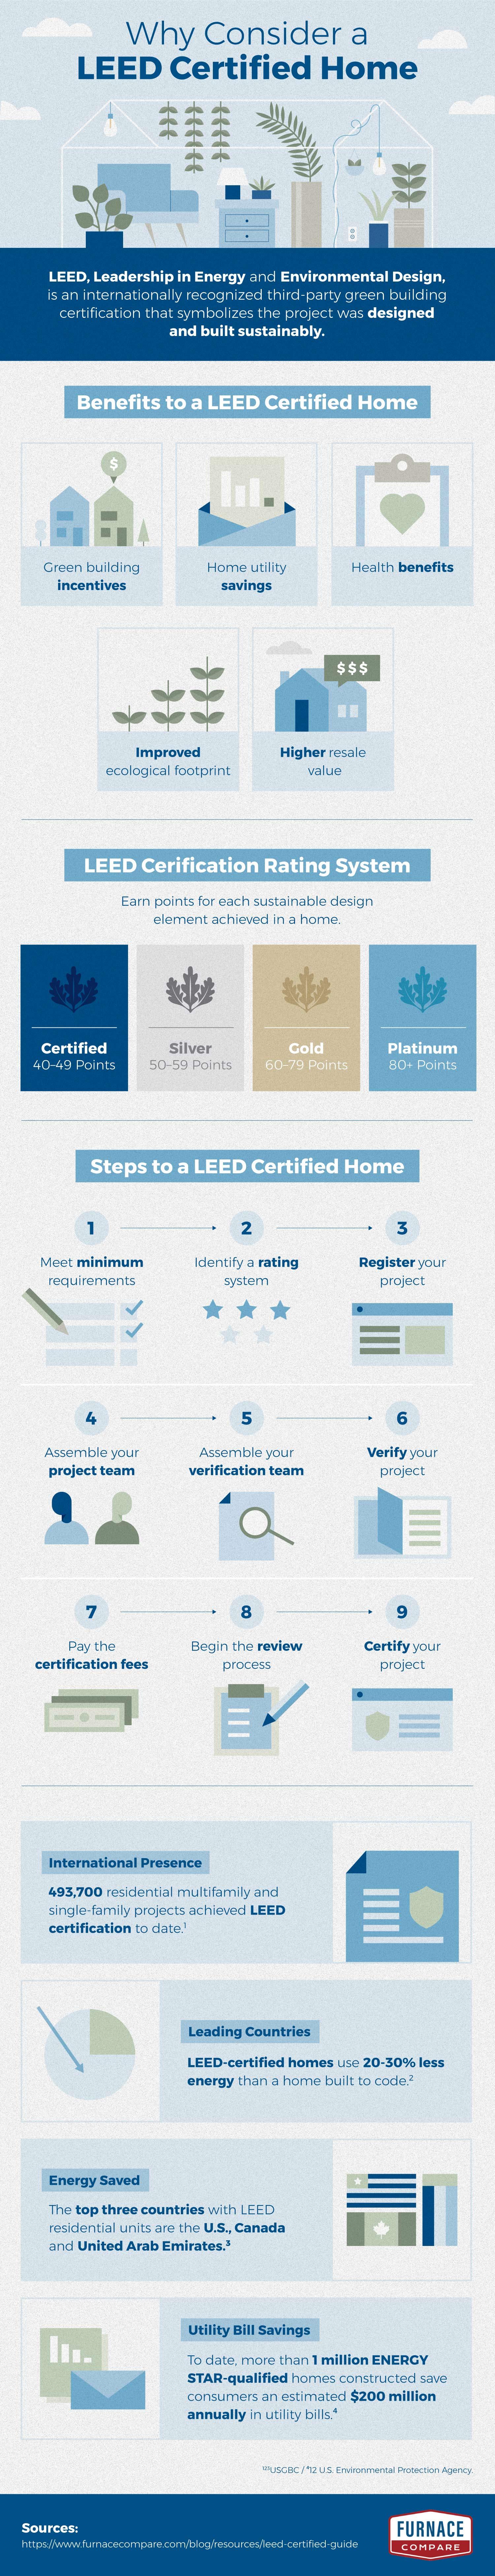 LEED-certified home